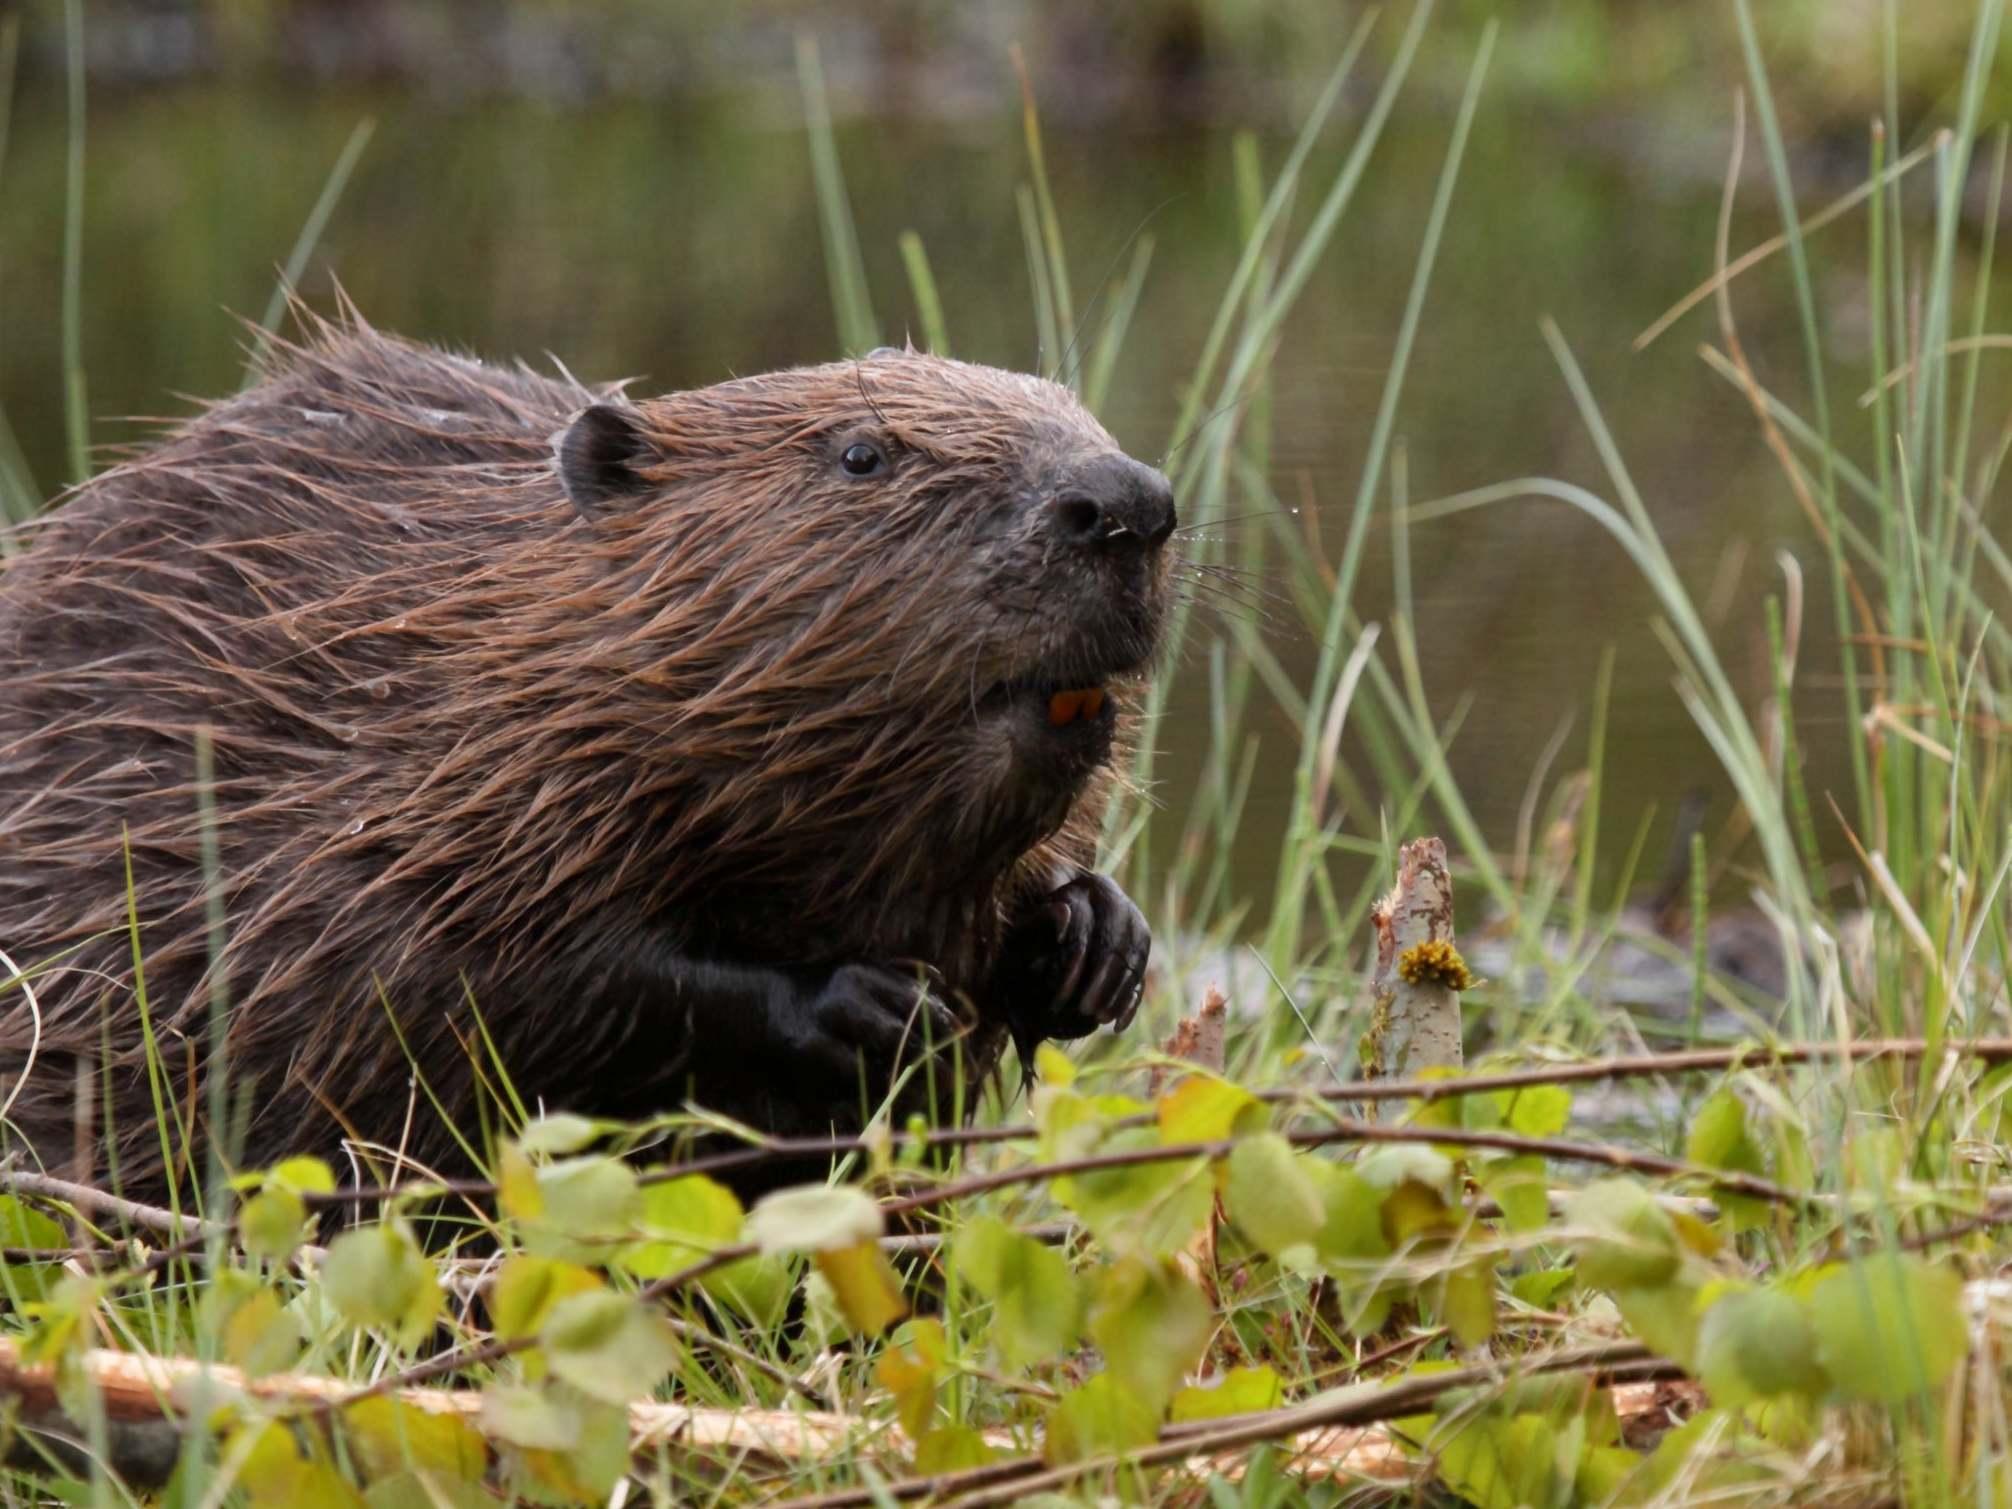 MPs to debate returning huge swathes of Britain to natural habitat in 'rewilding' scheme